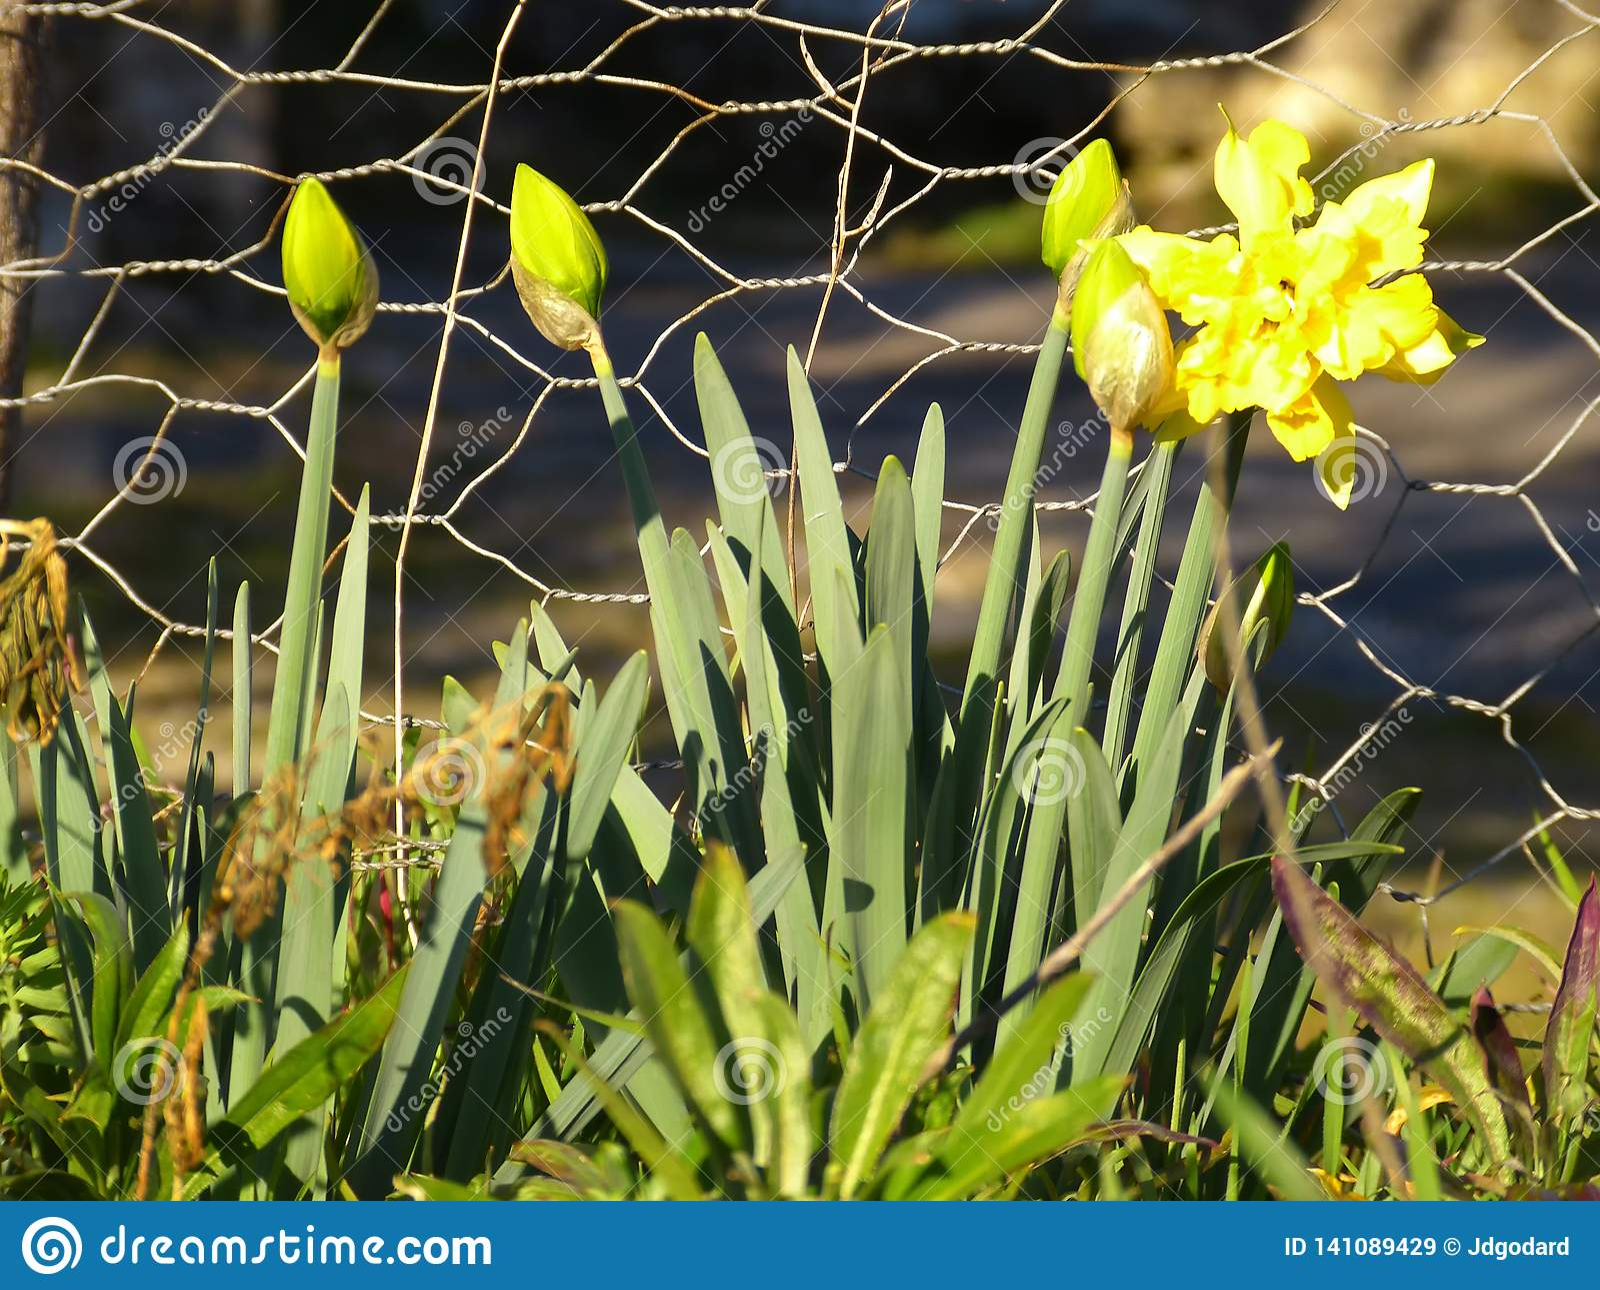 Daffodil narcissus jonquil